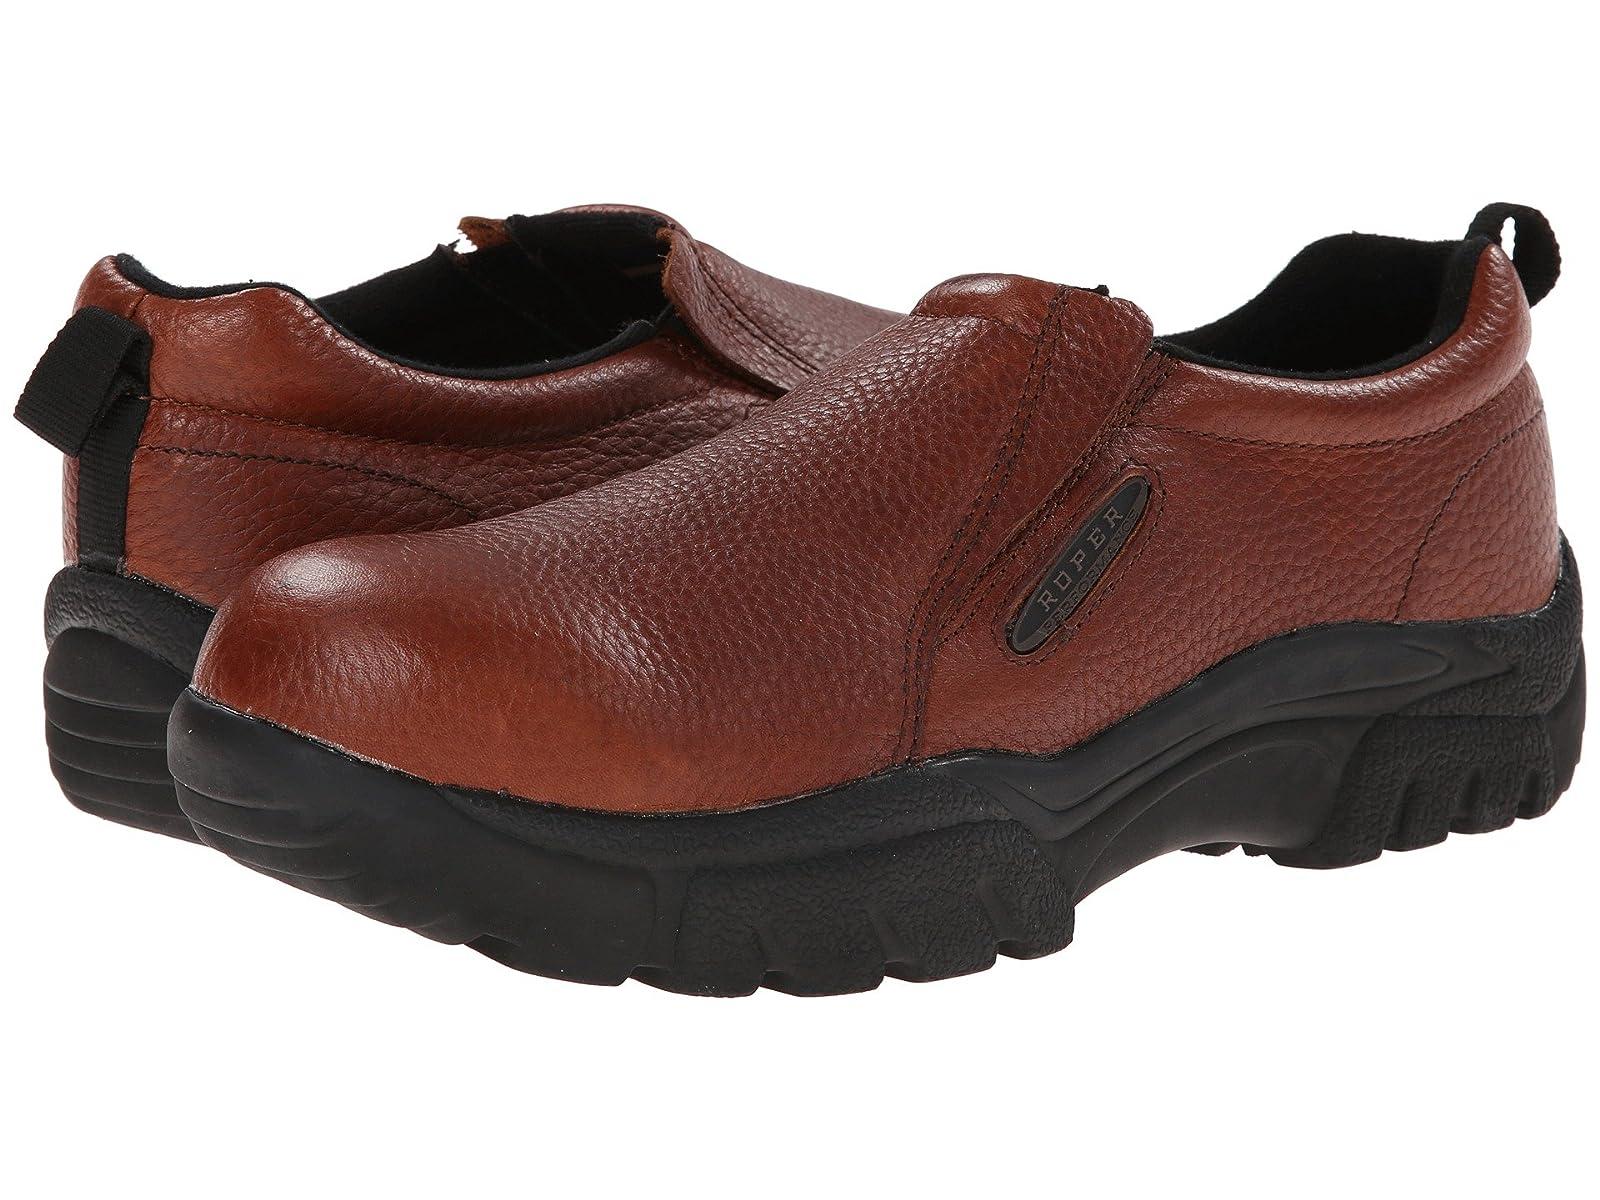 Roper Performance Slip On w/ Steel ToeAtmospheric grades have affordable shoes